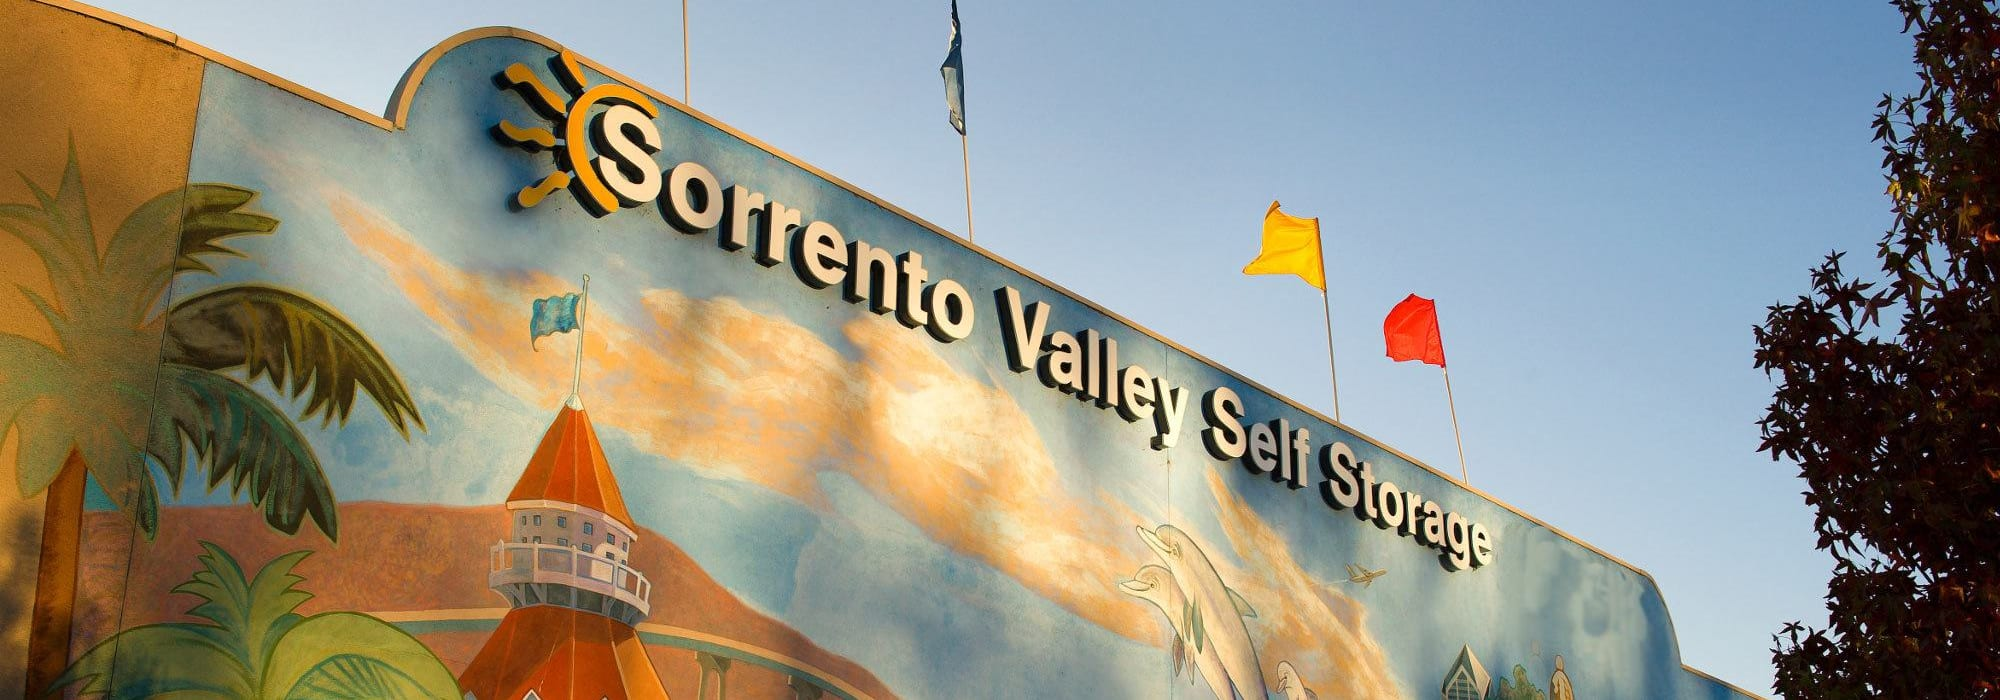 Branding on the exterior of Sorrento Valley Self Storage in San Diego, California